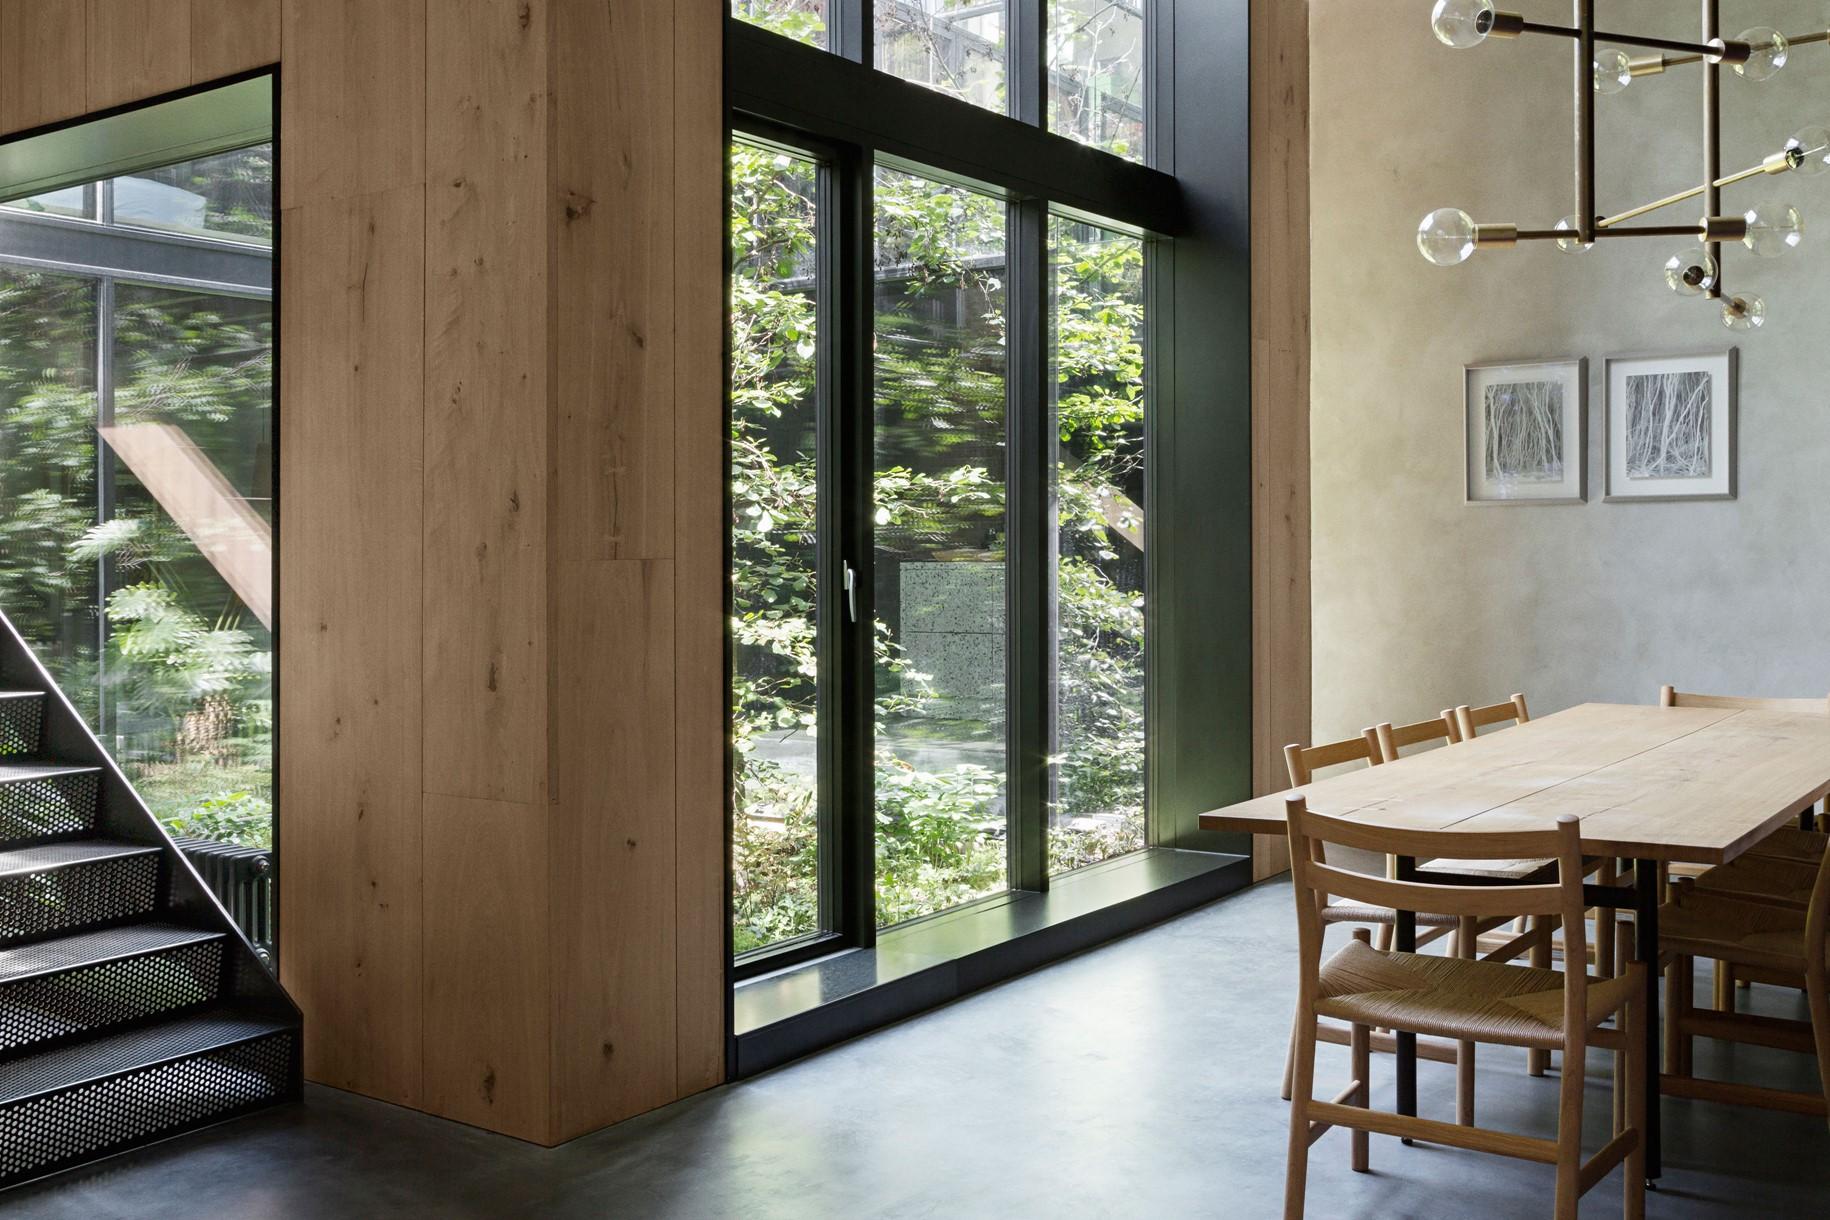 oak-hardwood-wall-cladding-heartoak_natural-oil_peters-house_dining-table_dinesen.jpg